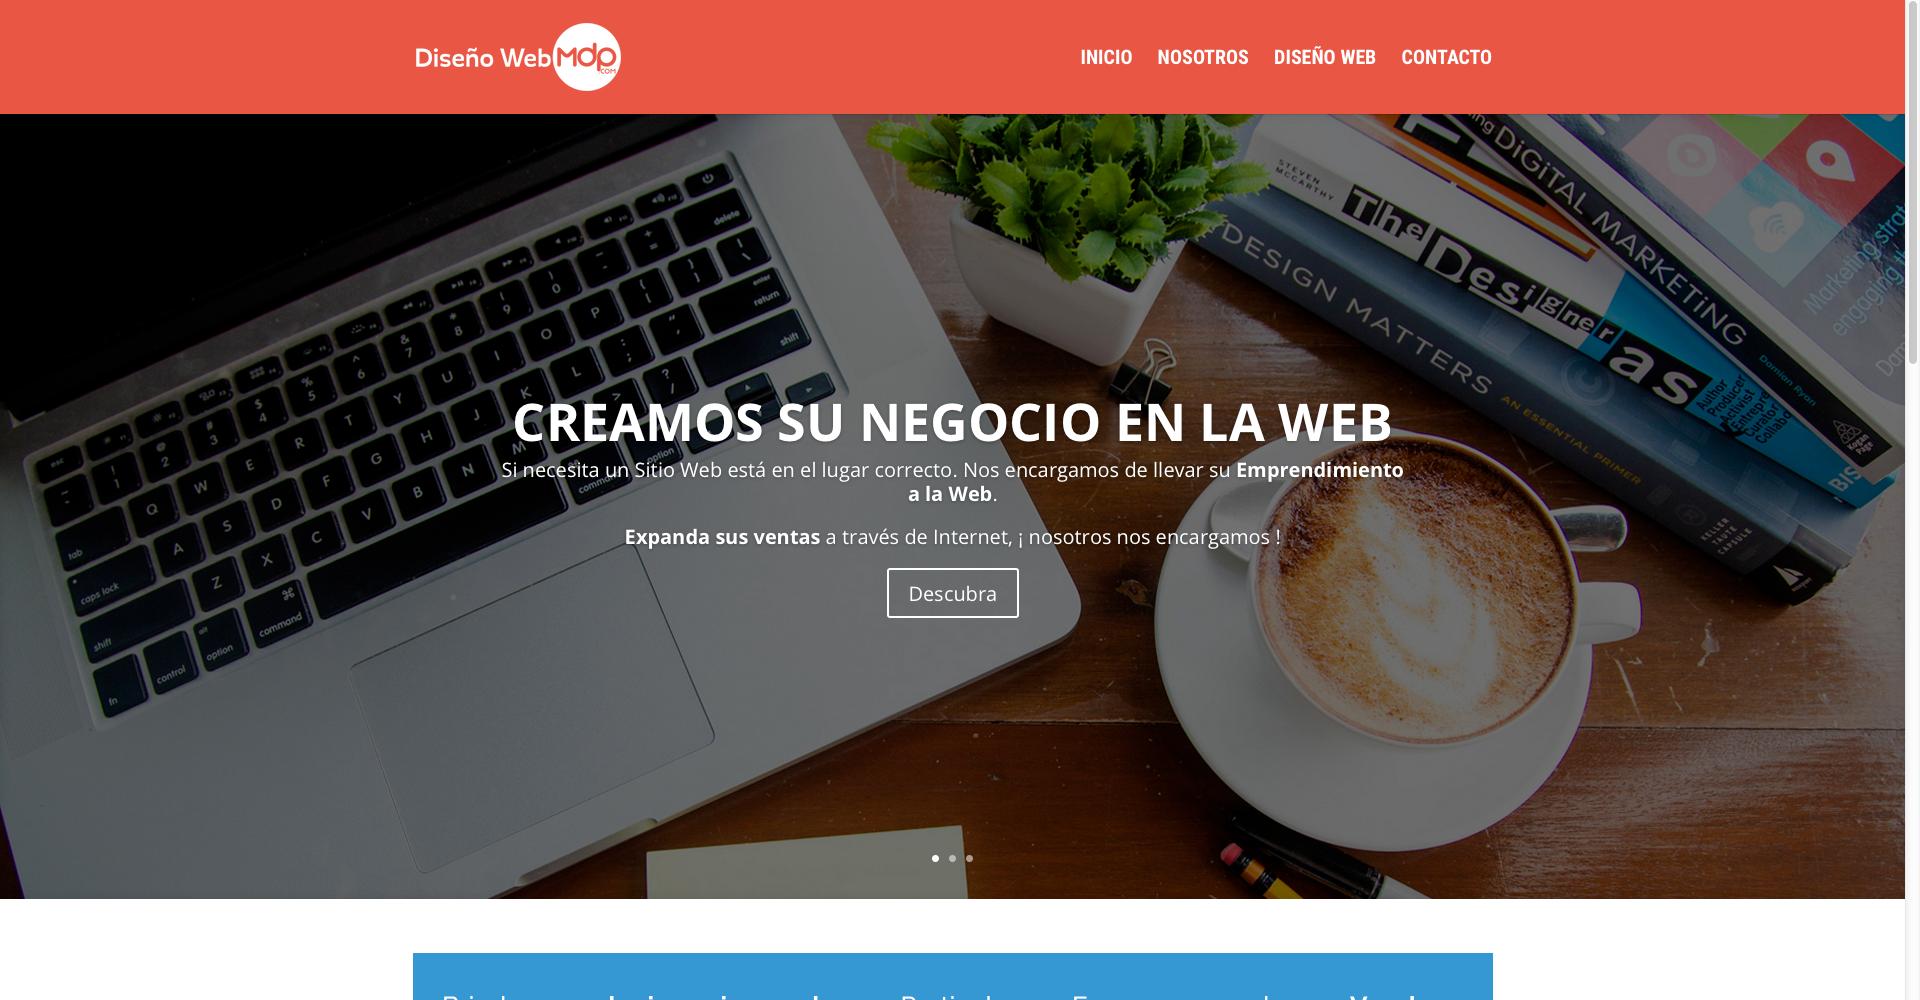 Diseño Web MDP